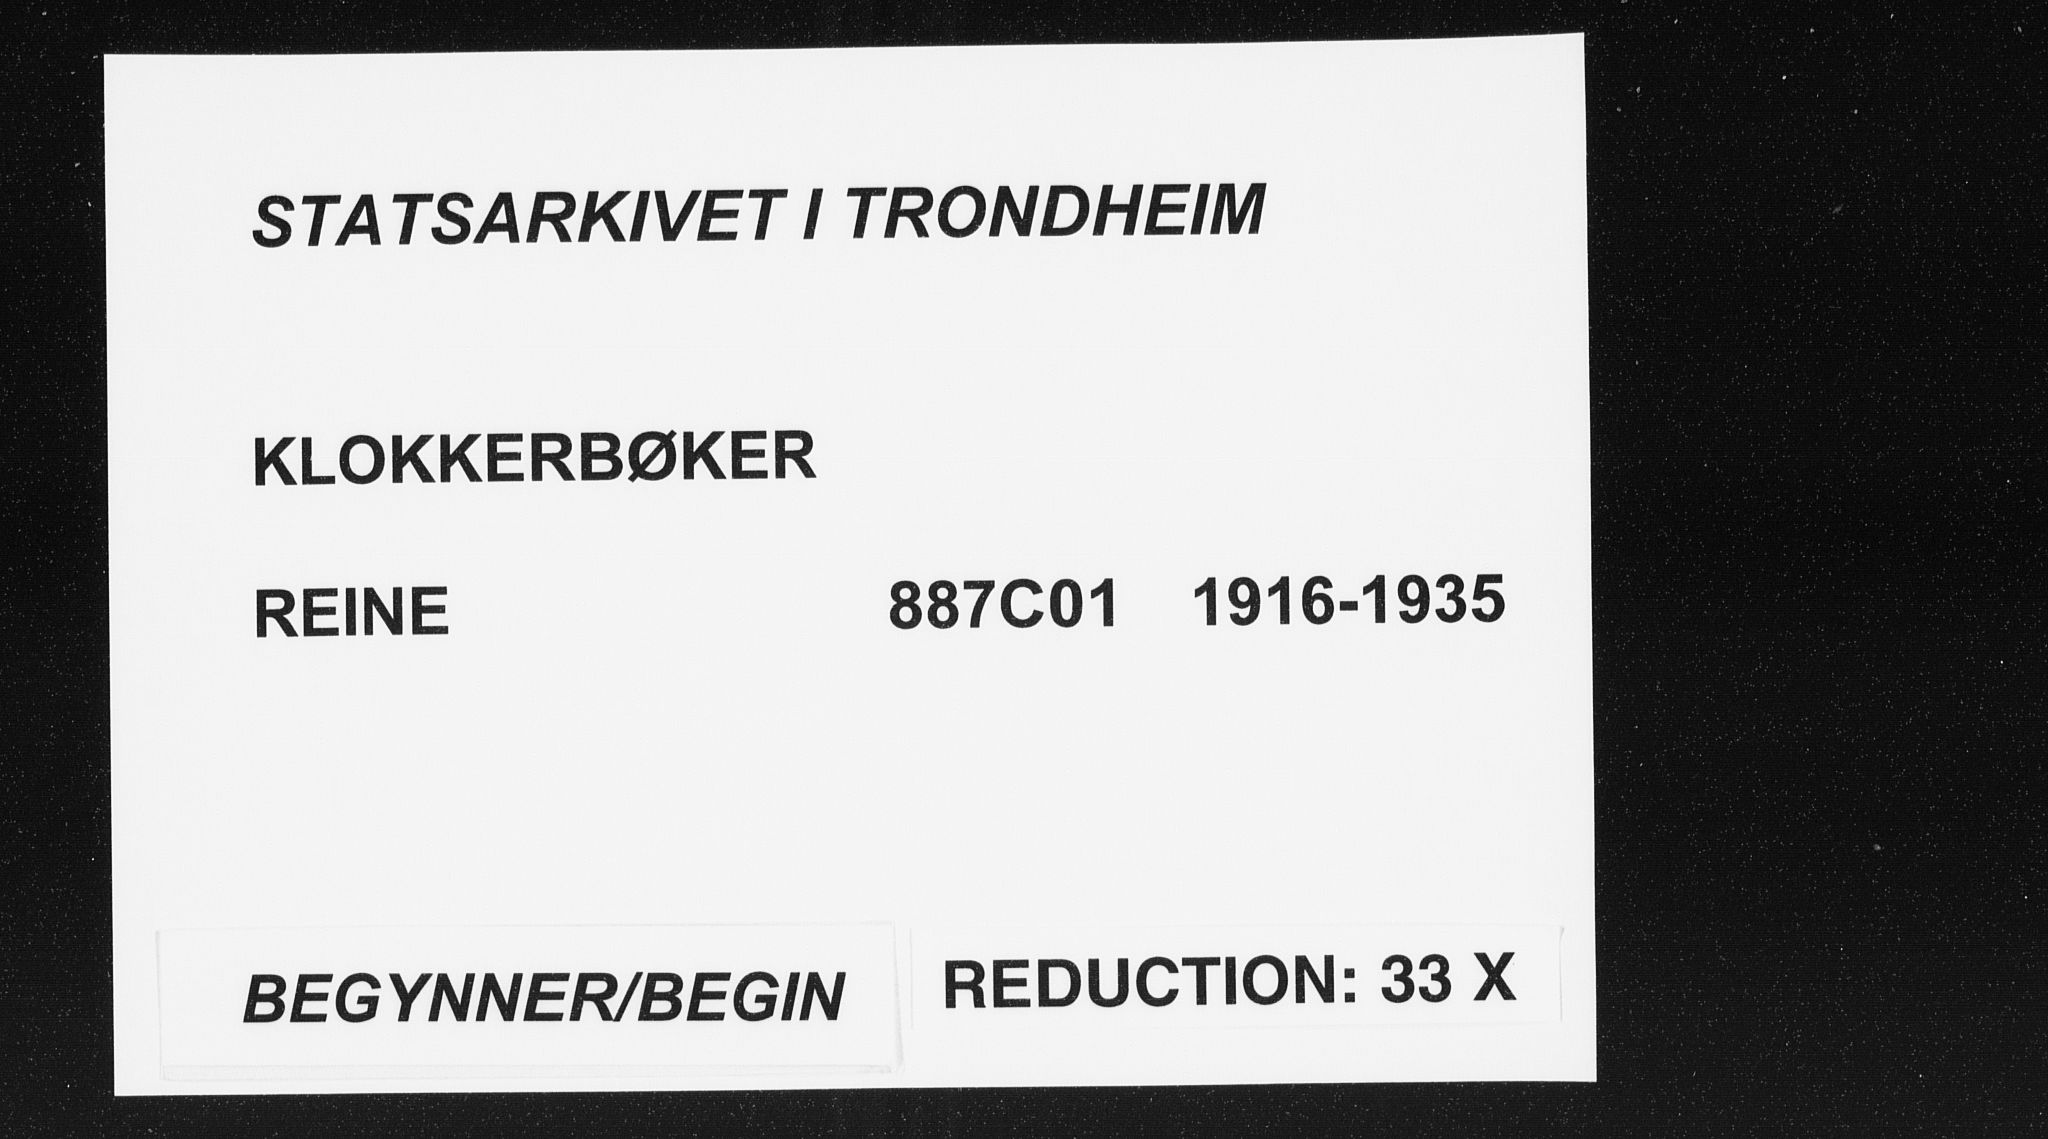 SAT, Ministerialprotokoller, klokkerbøker og fødselsregistre - Nordland, 887/L1229: Klokkerbok nr. 887C01, 1916-1935